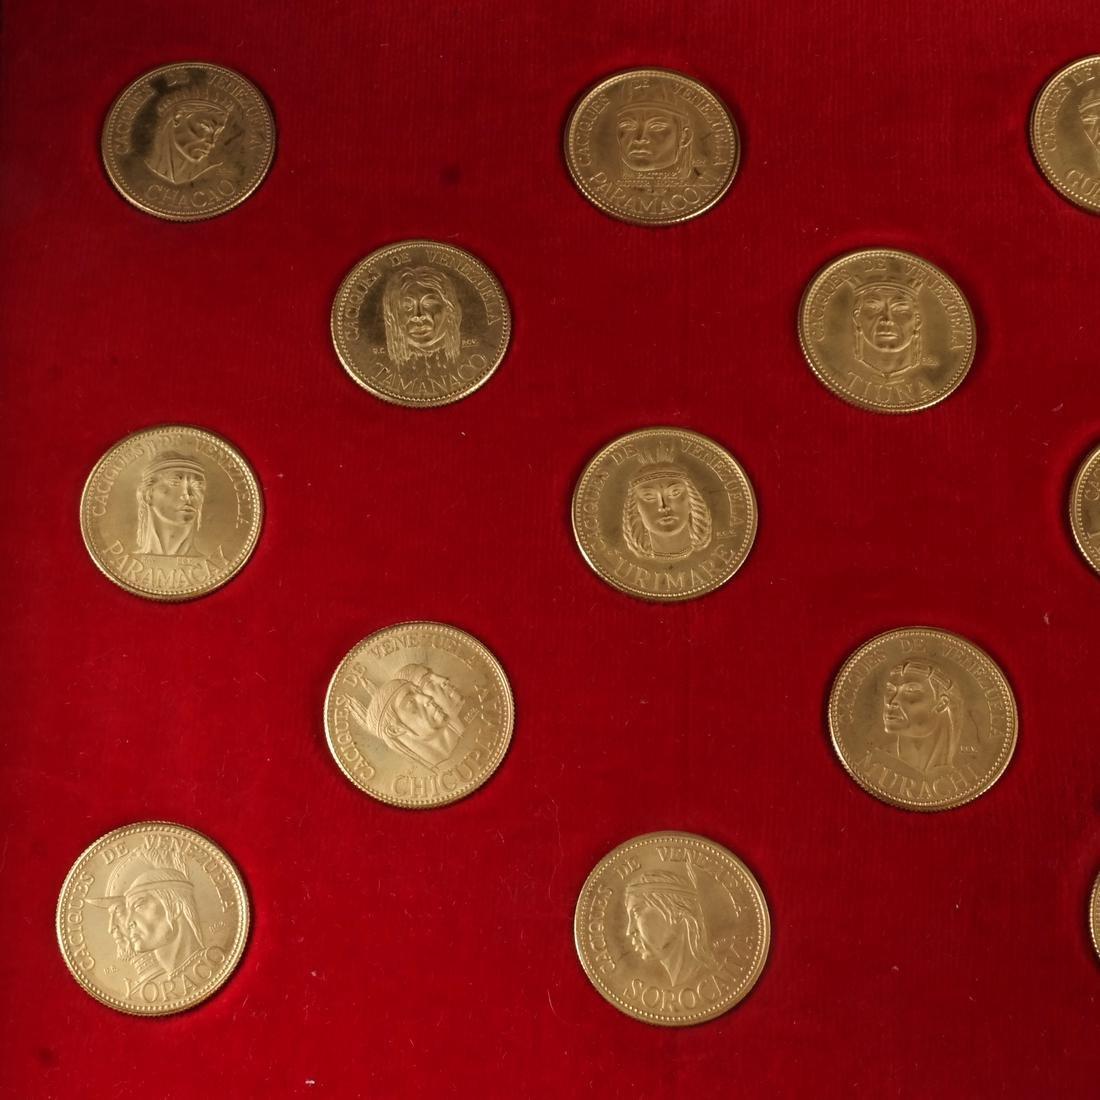 Venezuela Gold Set, 18 Coins, 1957 - 3